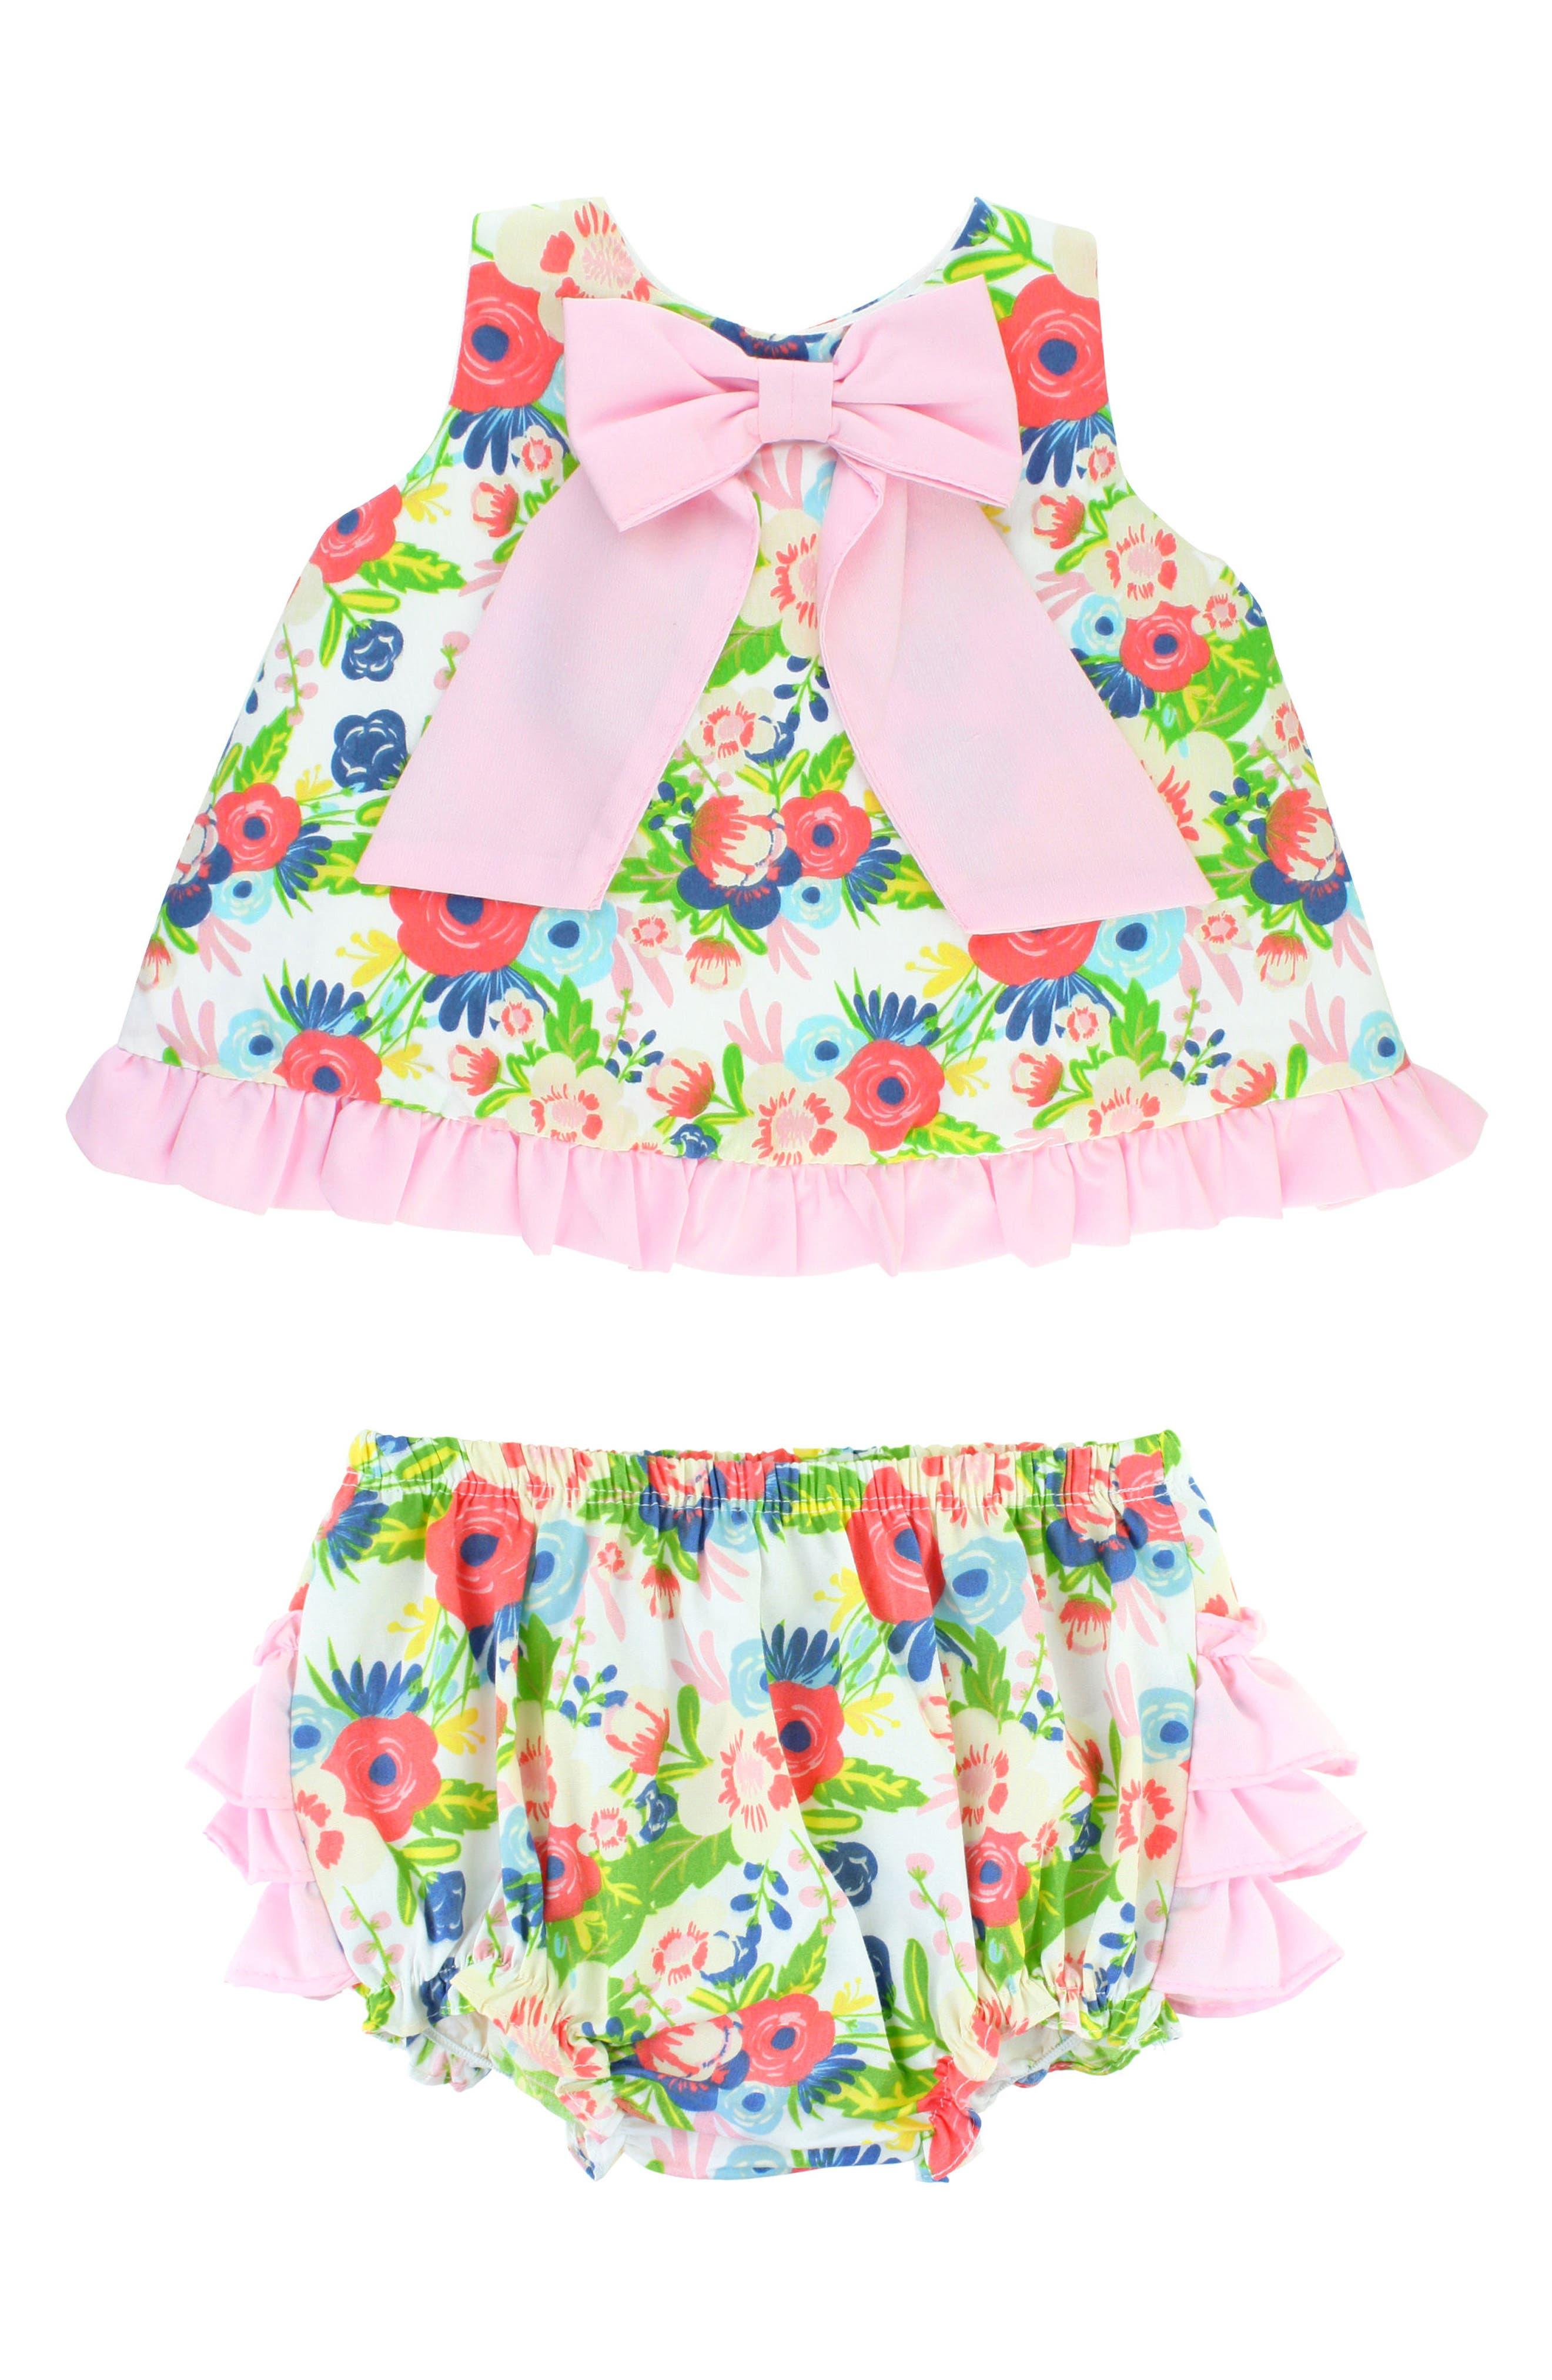 Alternate Image 1 Selected - RuffleButts English Garden Swing Top & Ruffle Bloomers Set (Baby Girls)